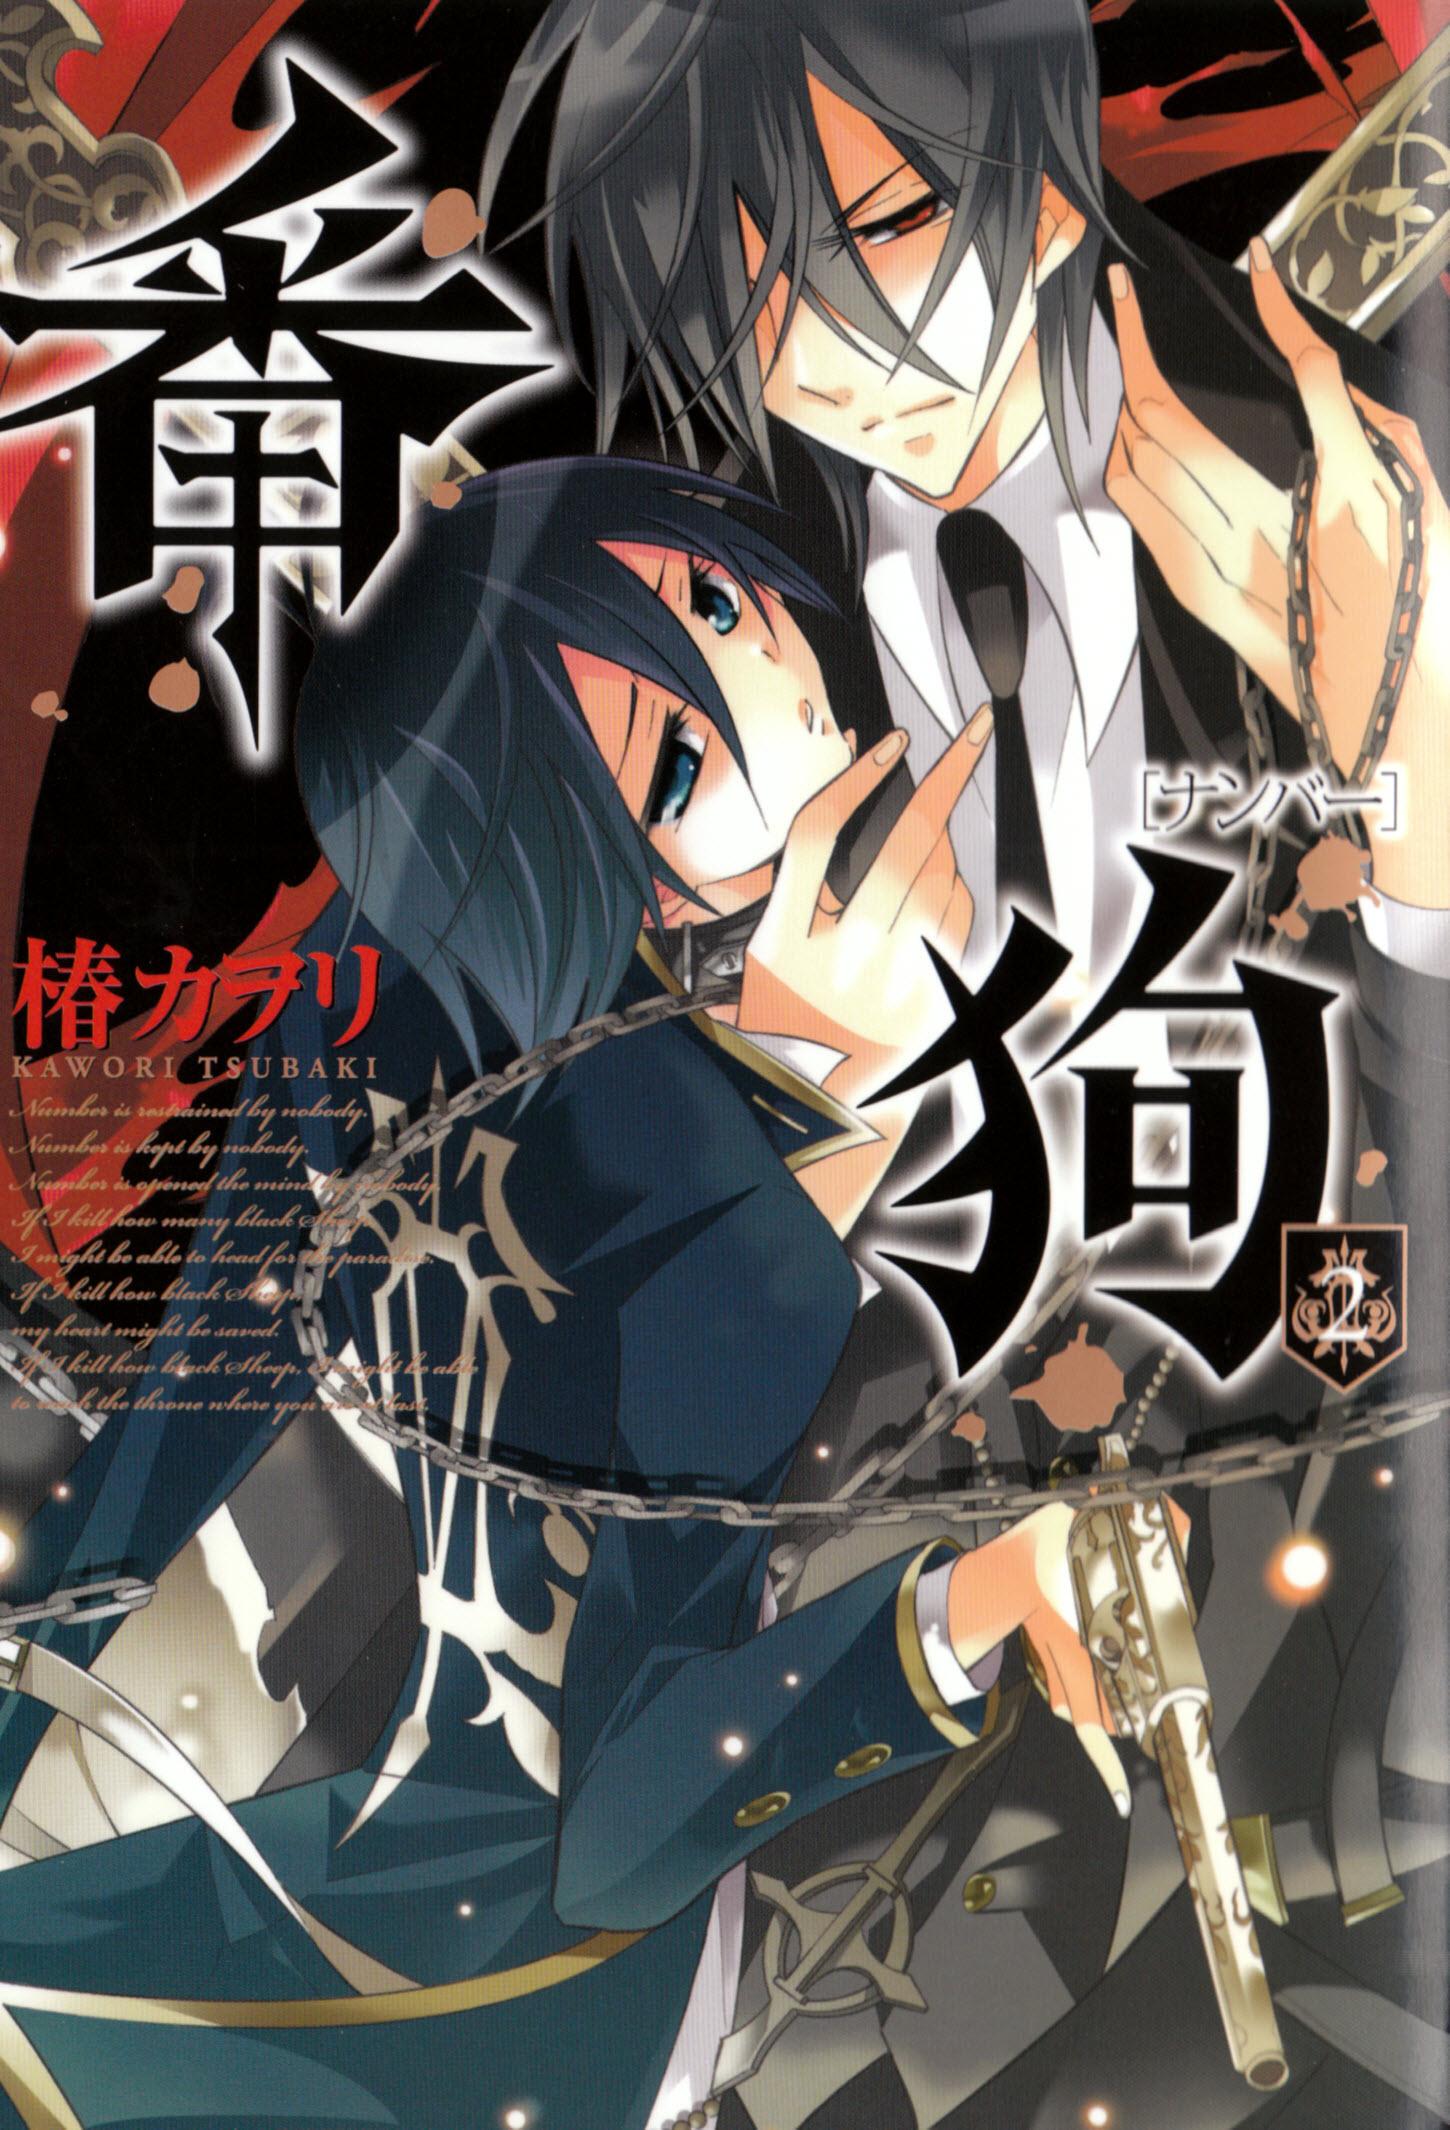 Number (Manga) - Kawori Tsubaki (Mangaka) - Zerochan Anime ...